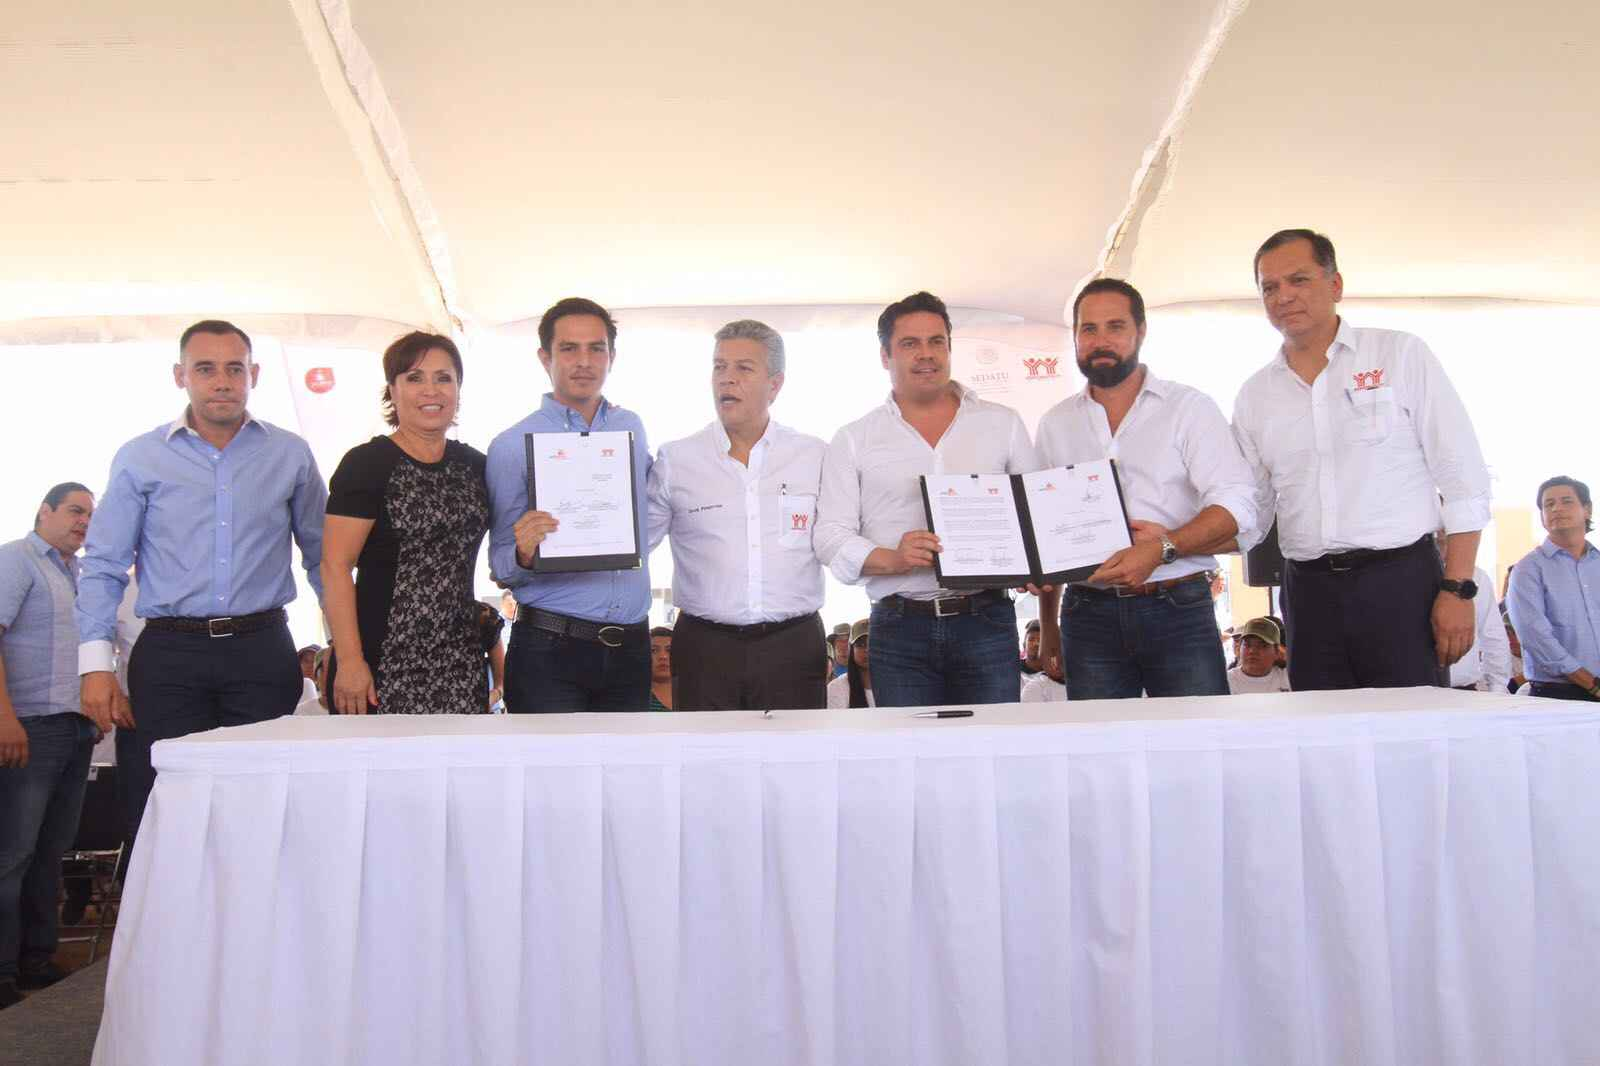 Jornaleros de Jalisco e Infonavit firman convenio